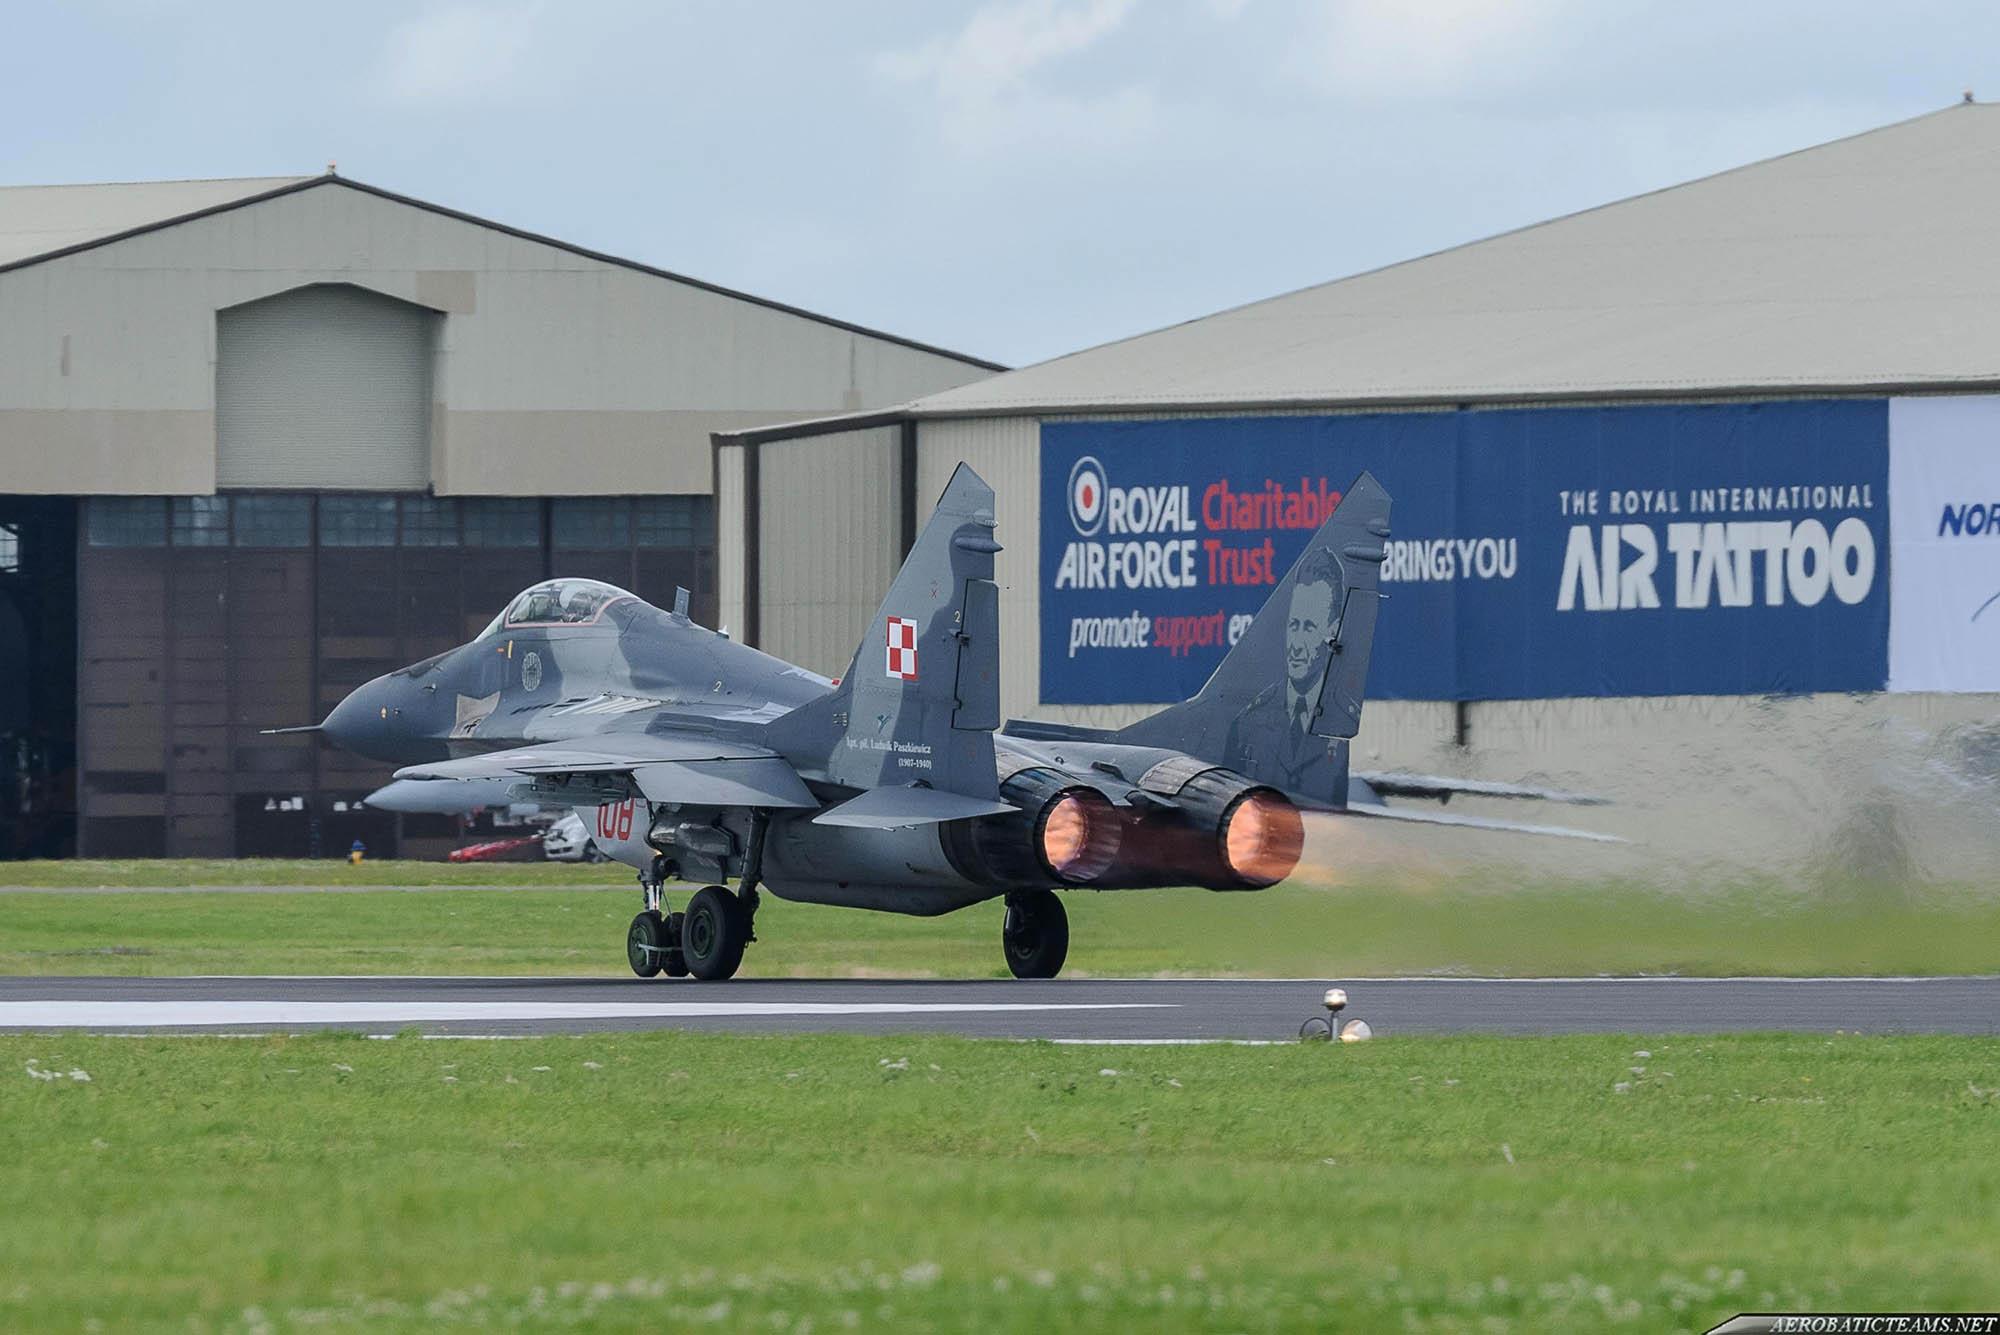 Polish Air Force MiG-29